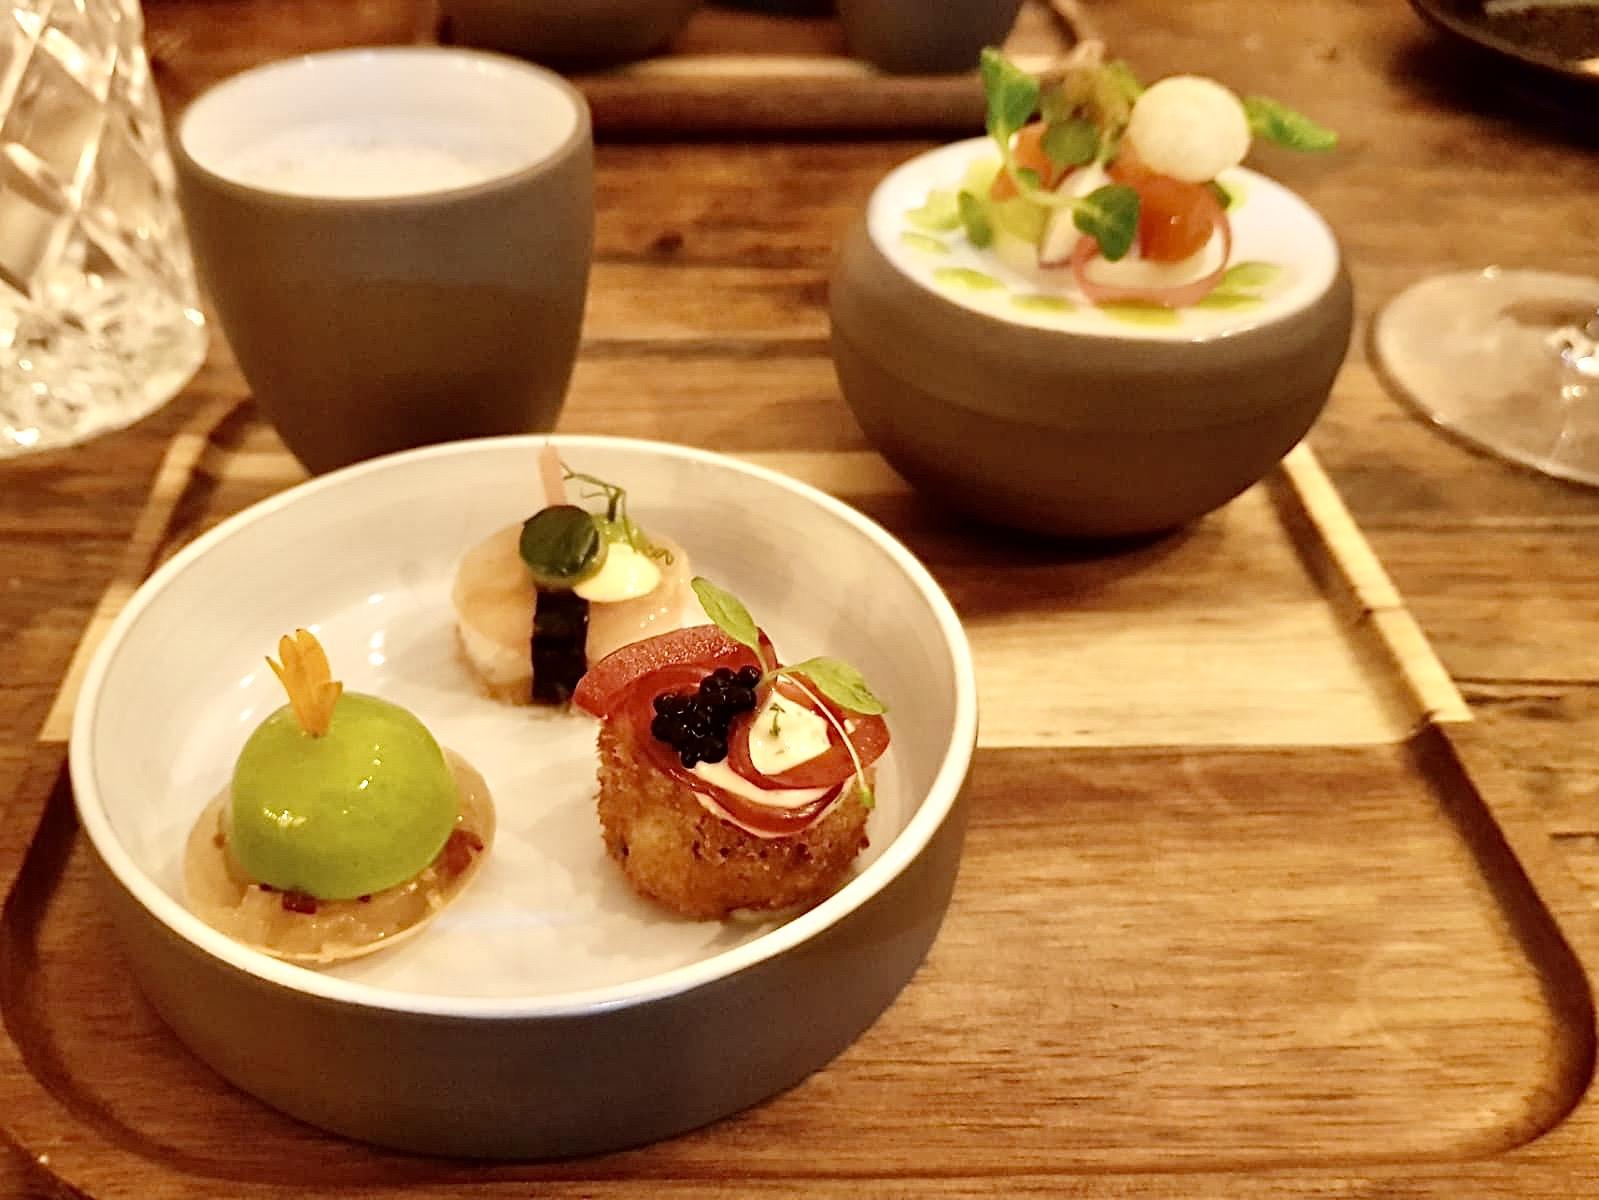 Menü im Restaurant Jellyfish: Amuse